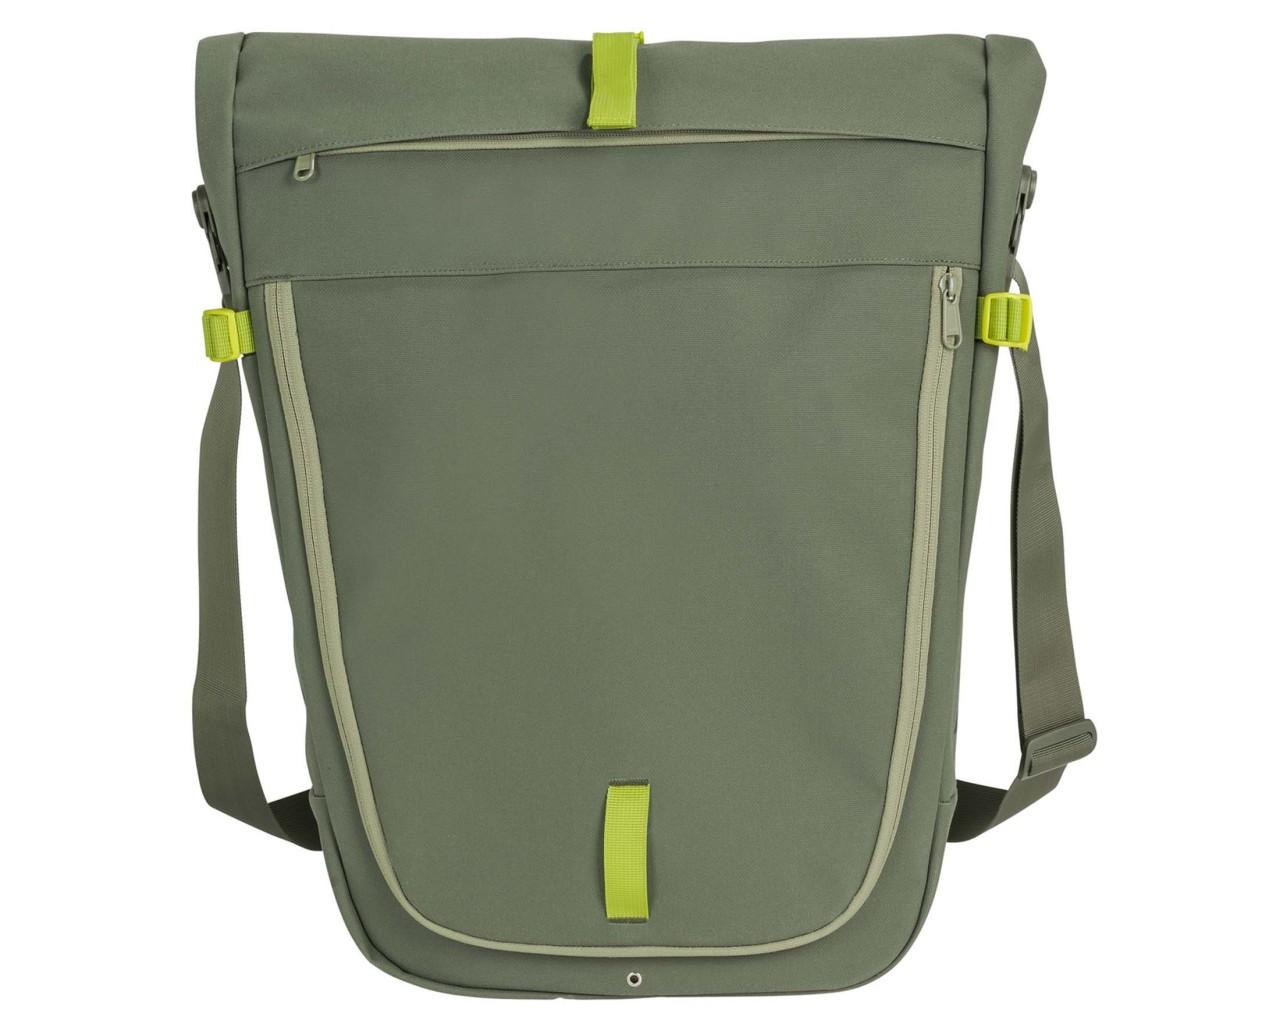 Vaude ExCycling Back rear pannier (single bag) | cedar wood